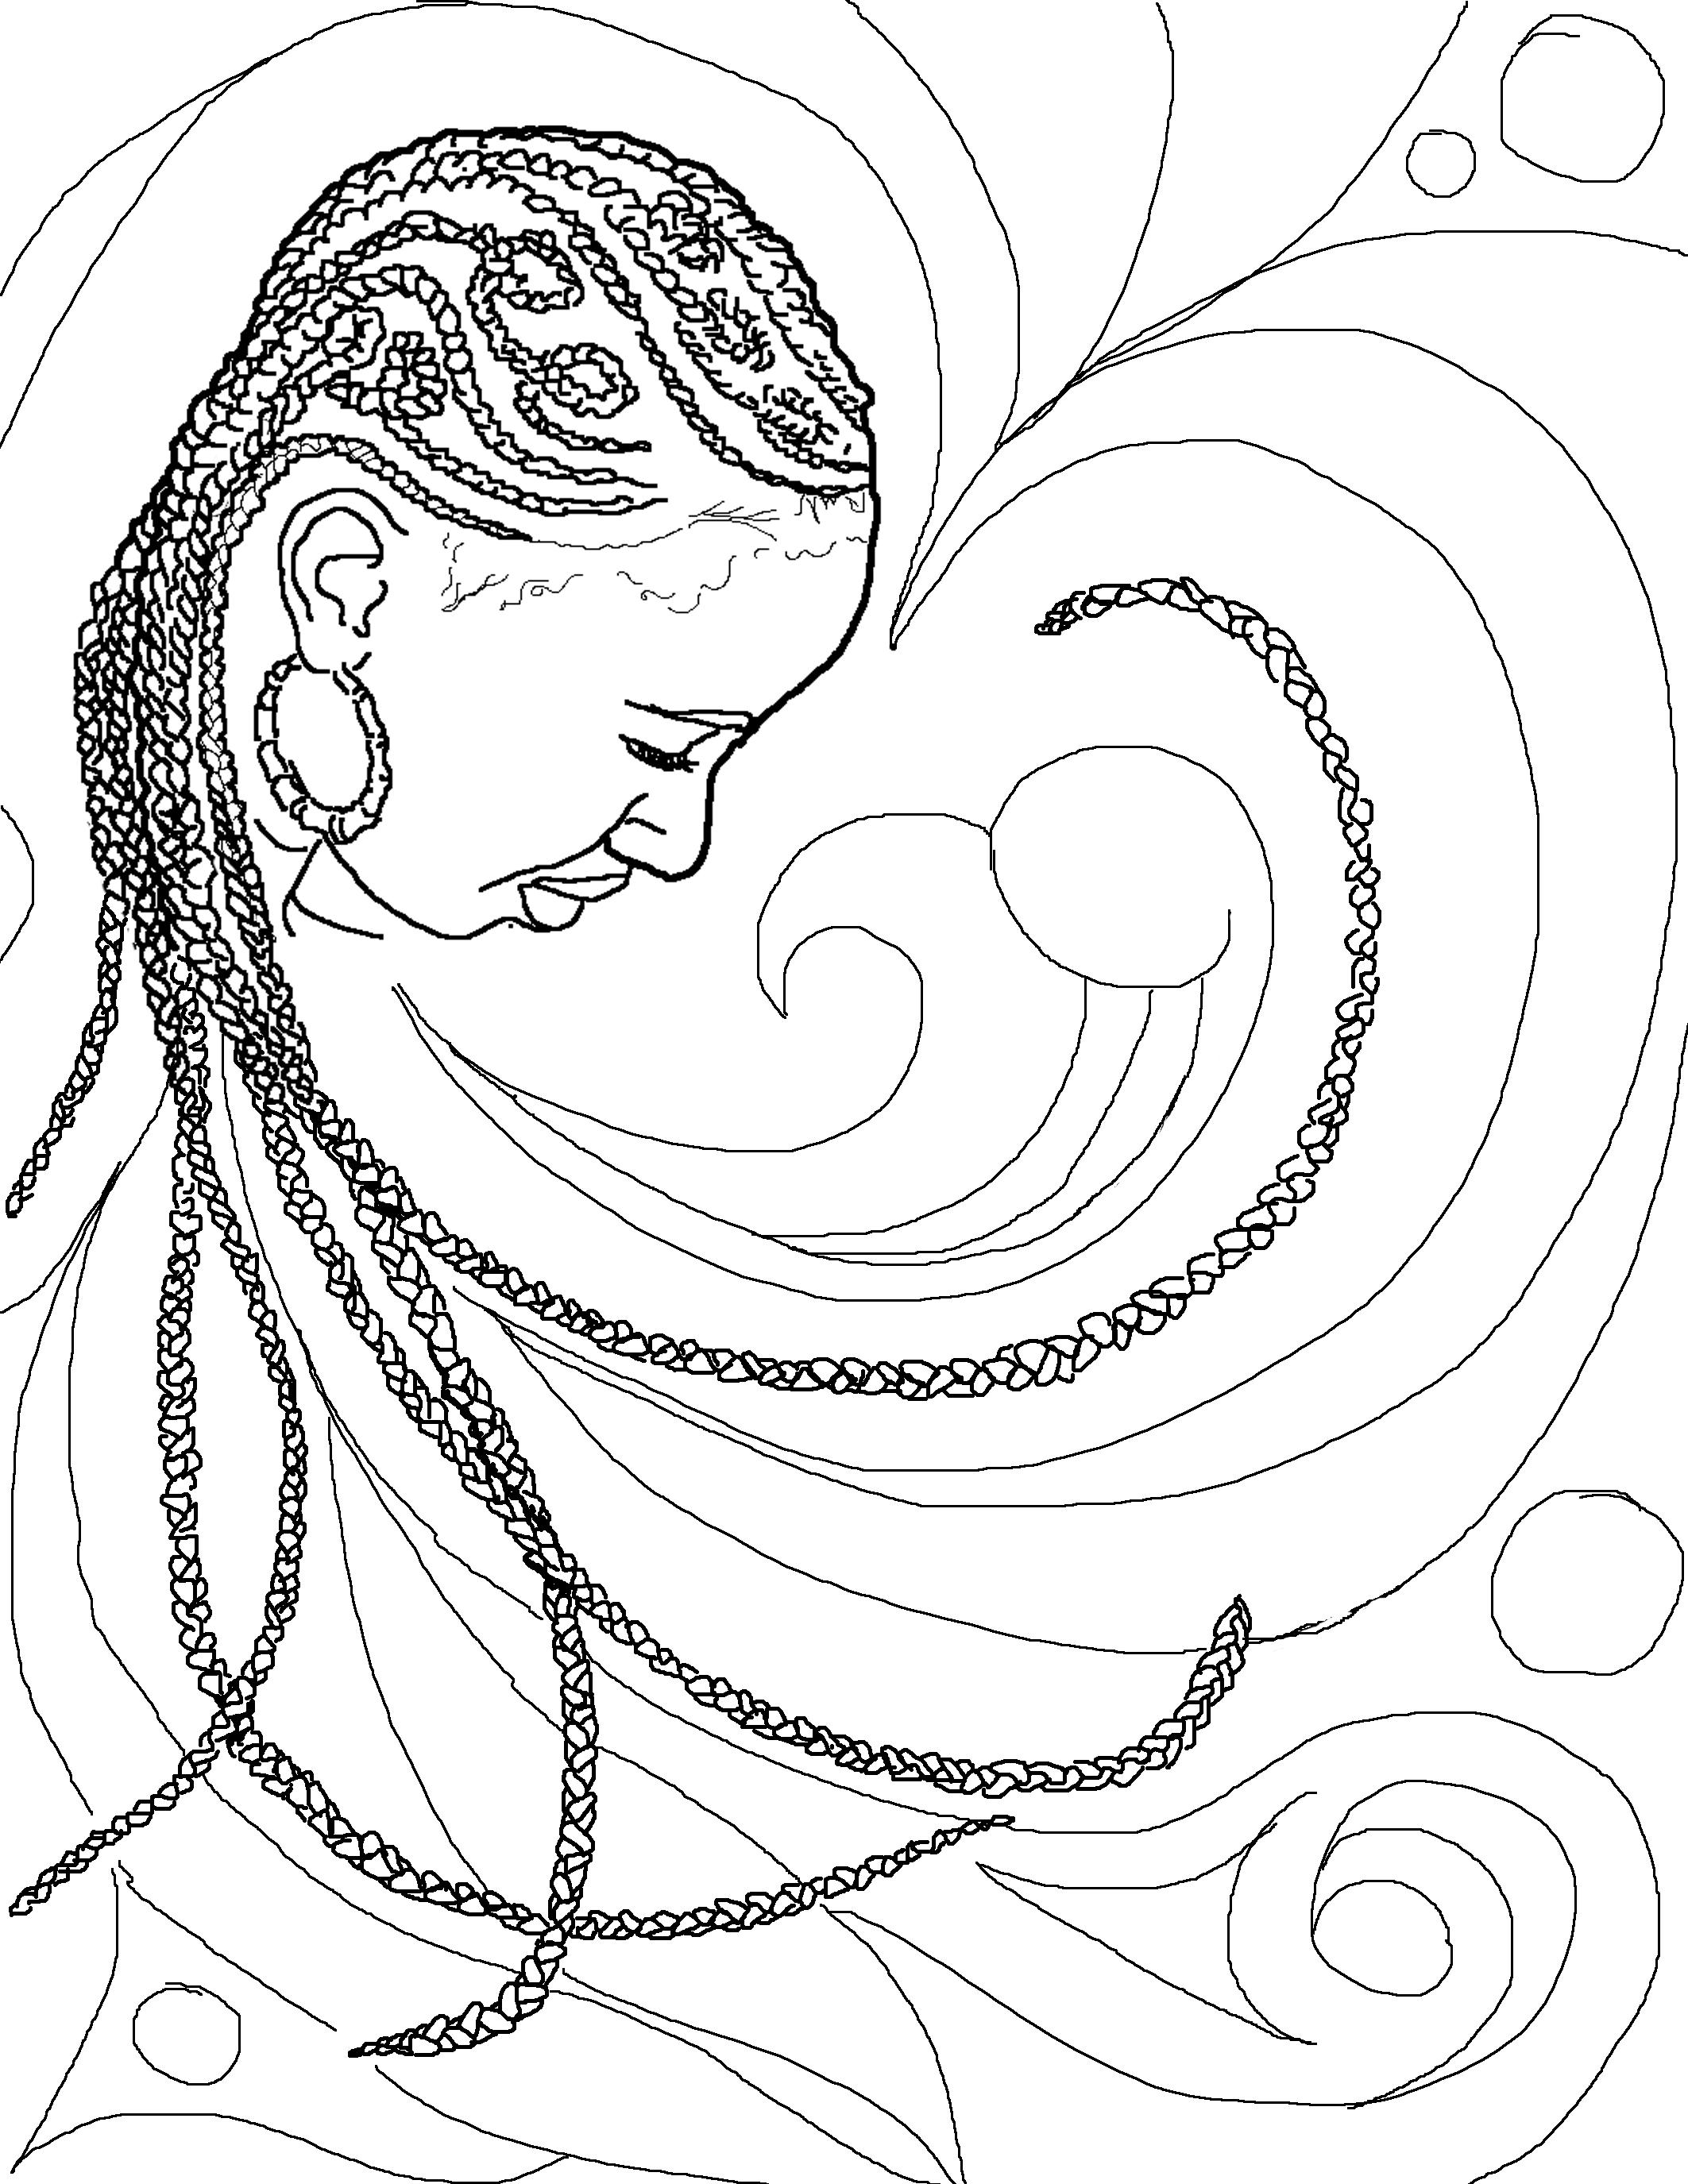 Cornrows_Coloring.jpg